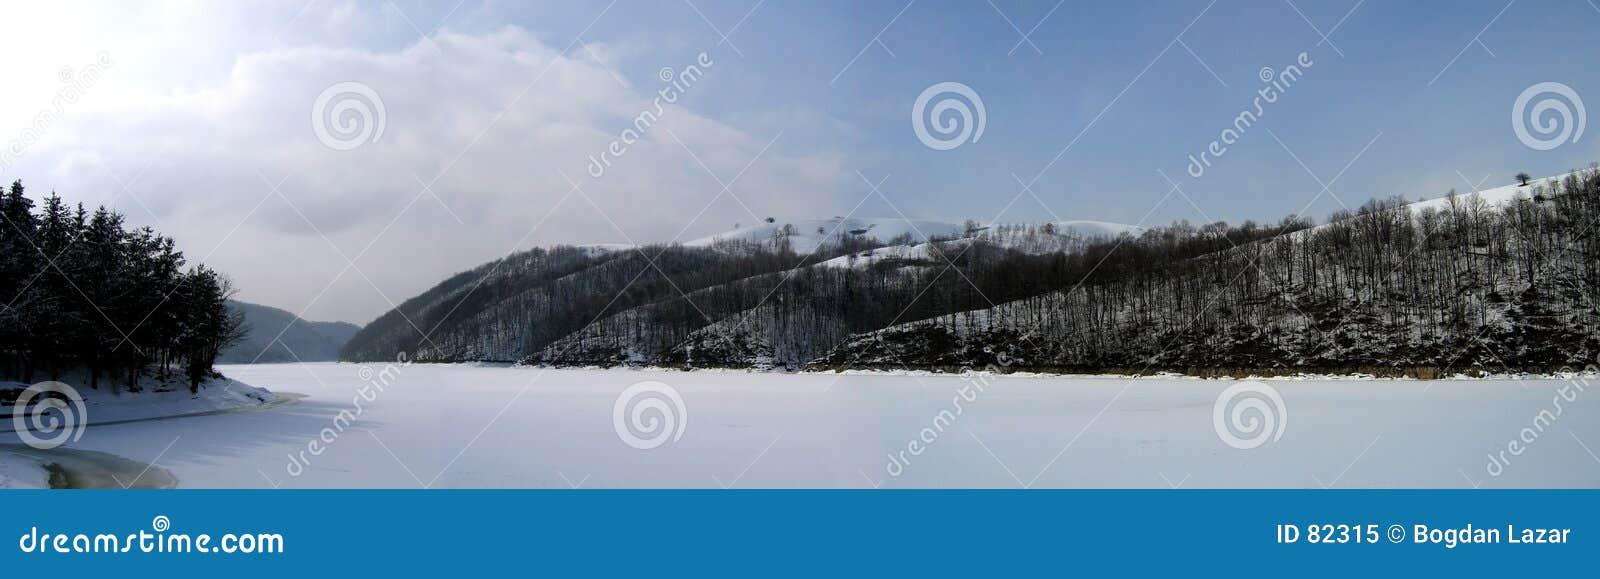 Panorama zimy lake